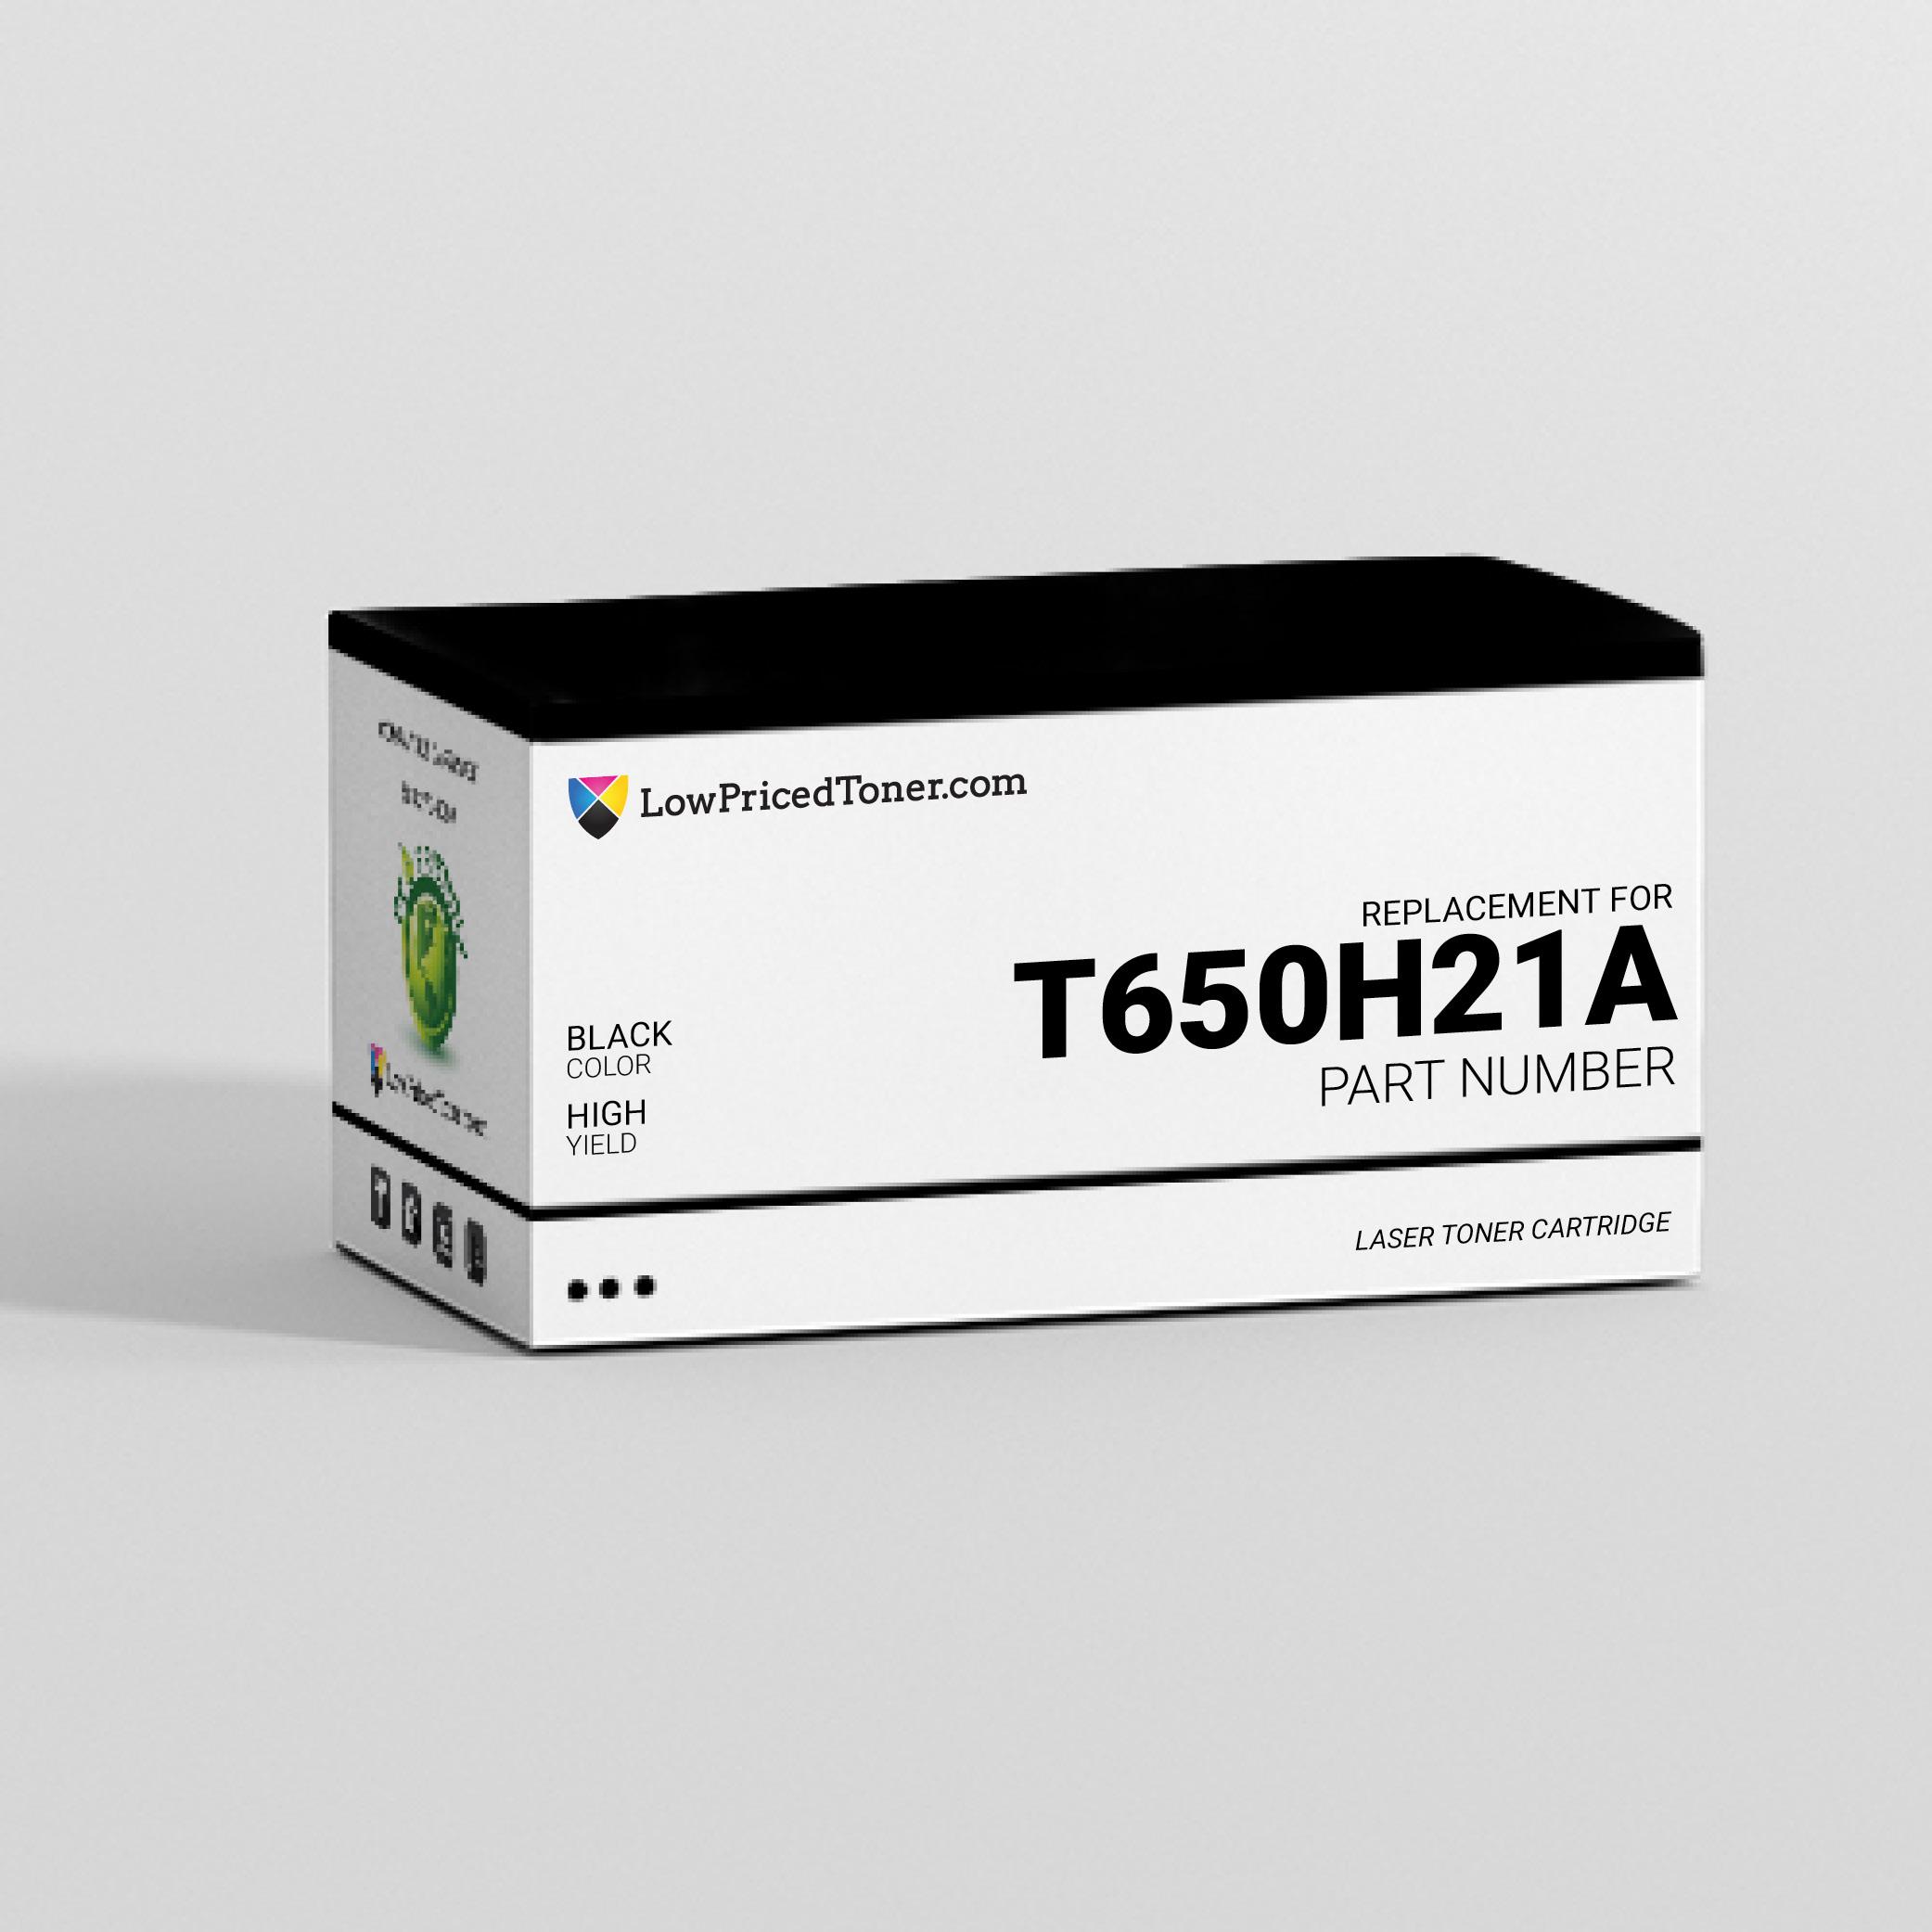 Lexmark T650H21A Remanufactured Black Laser Toner Cartridge High Yield